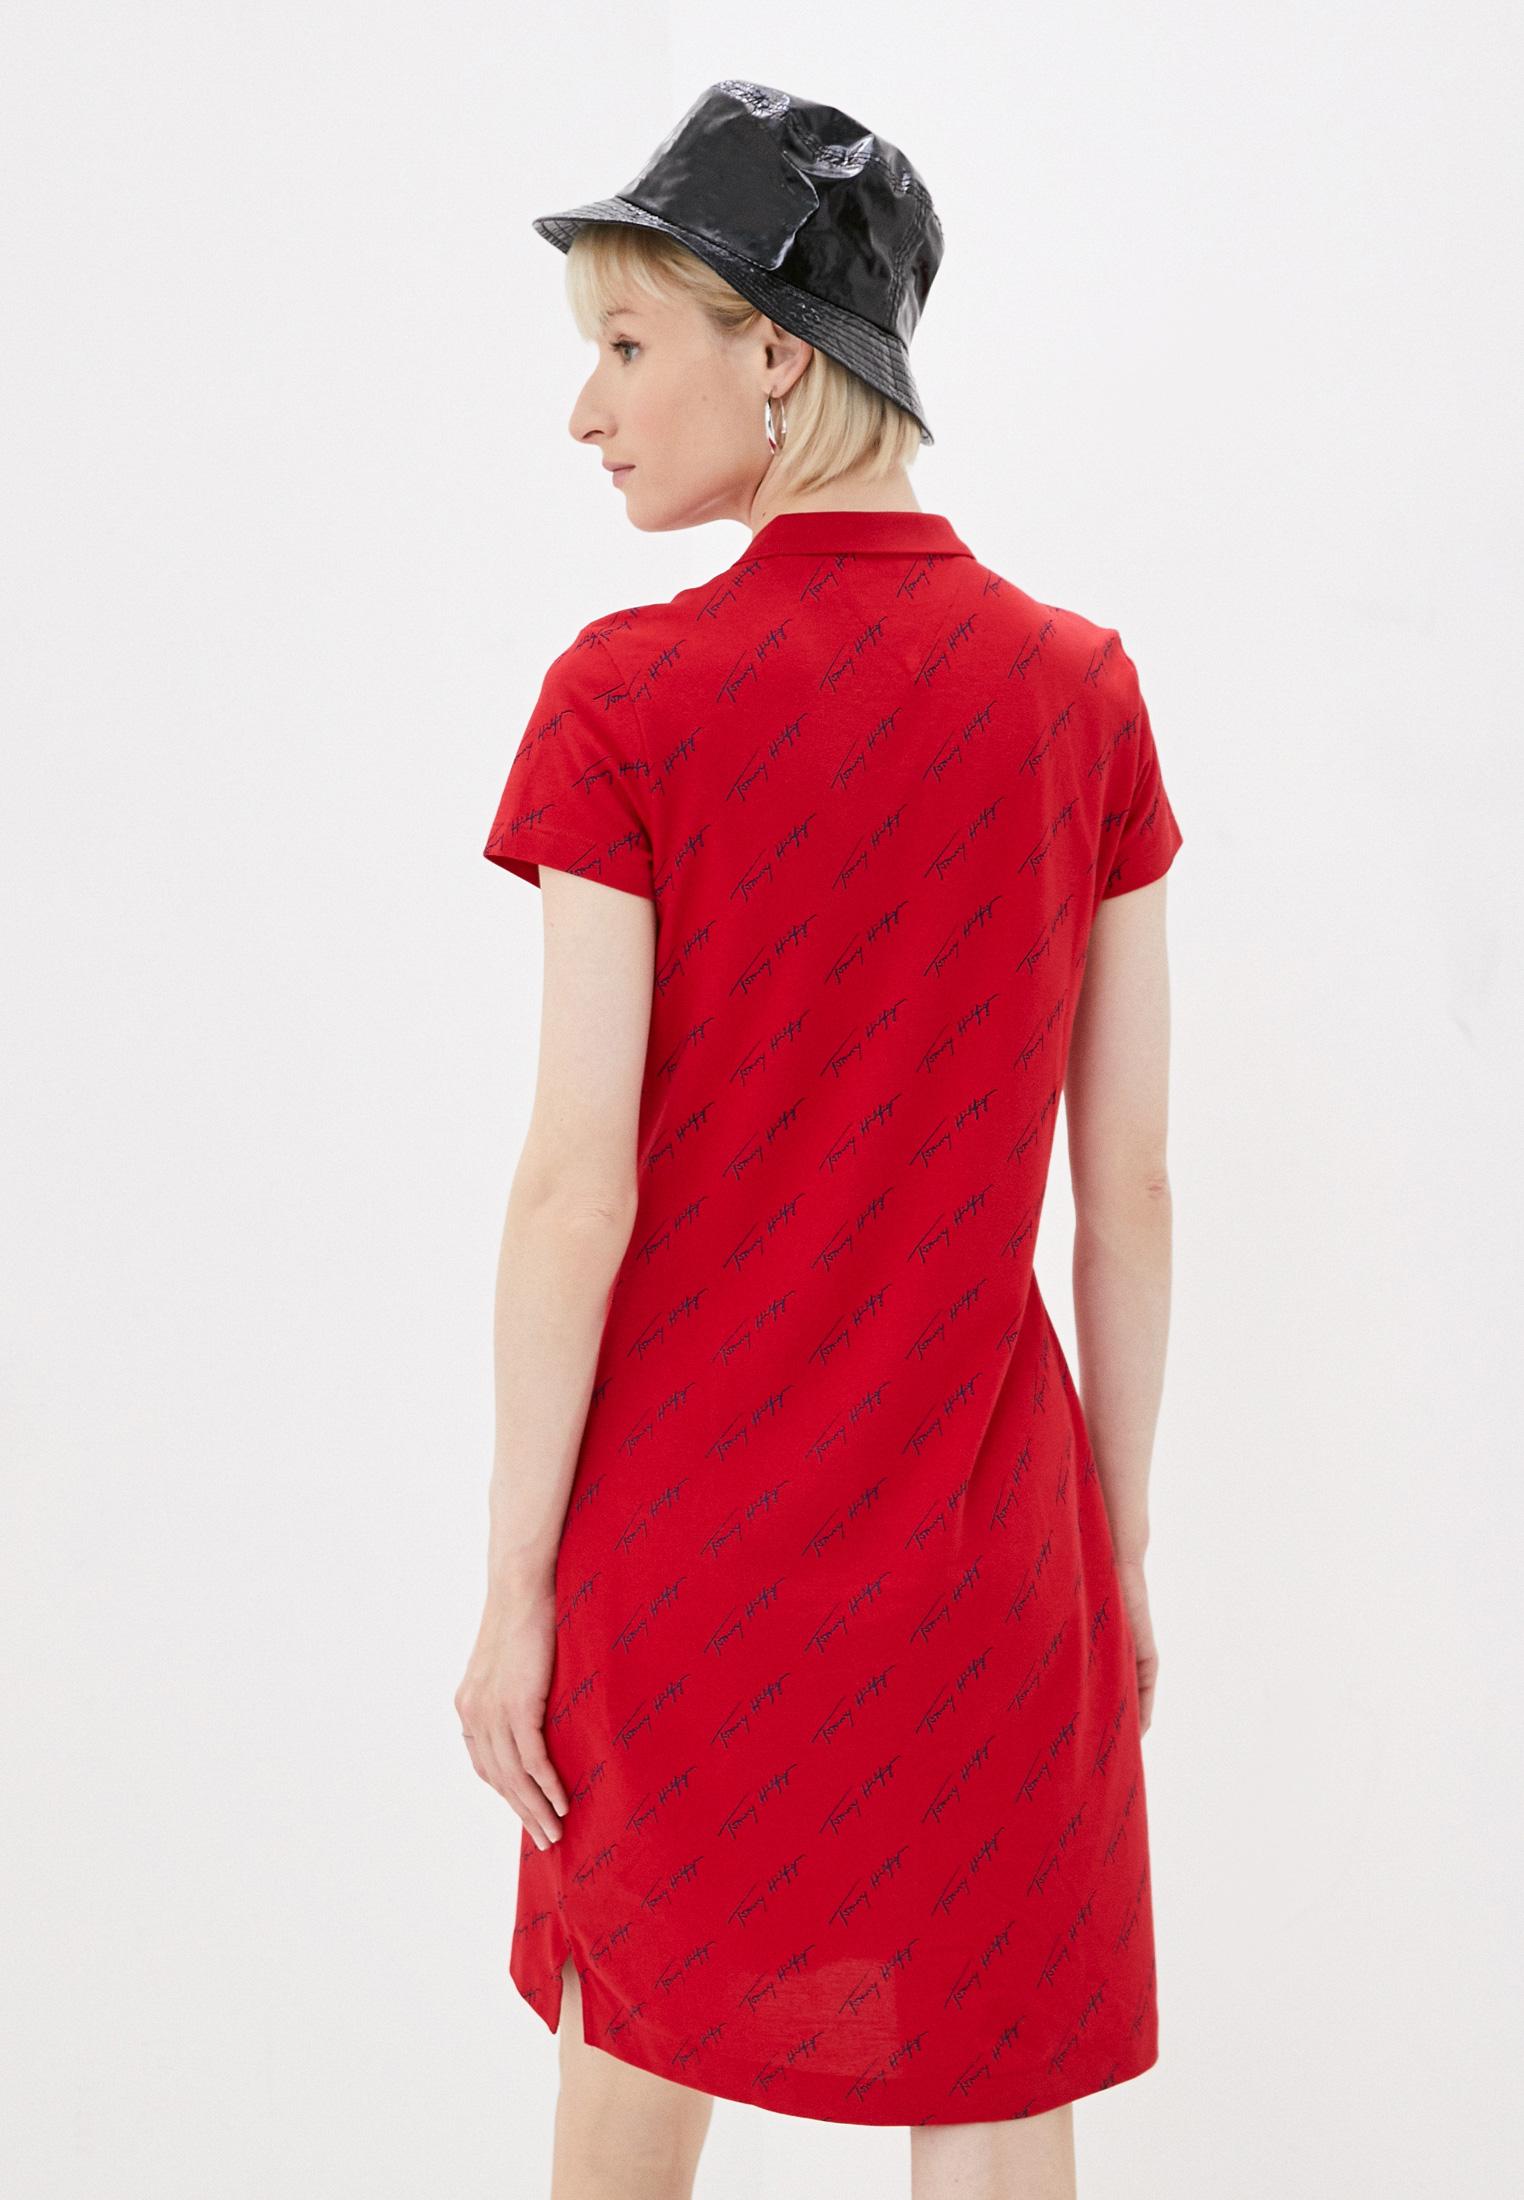 Платье Tommy Hilfiger (Томми Хилфигер) WW0WW26193: изображение 3